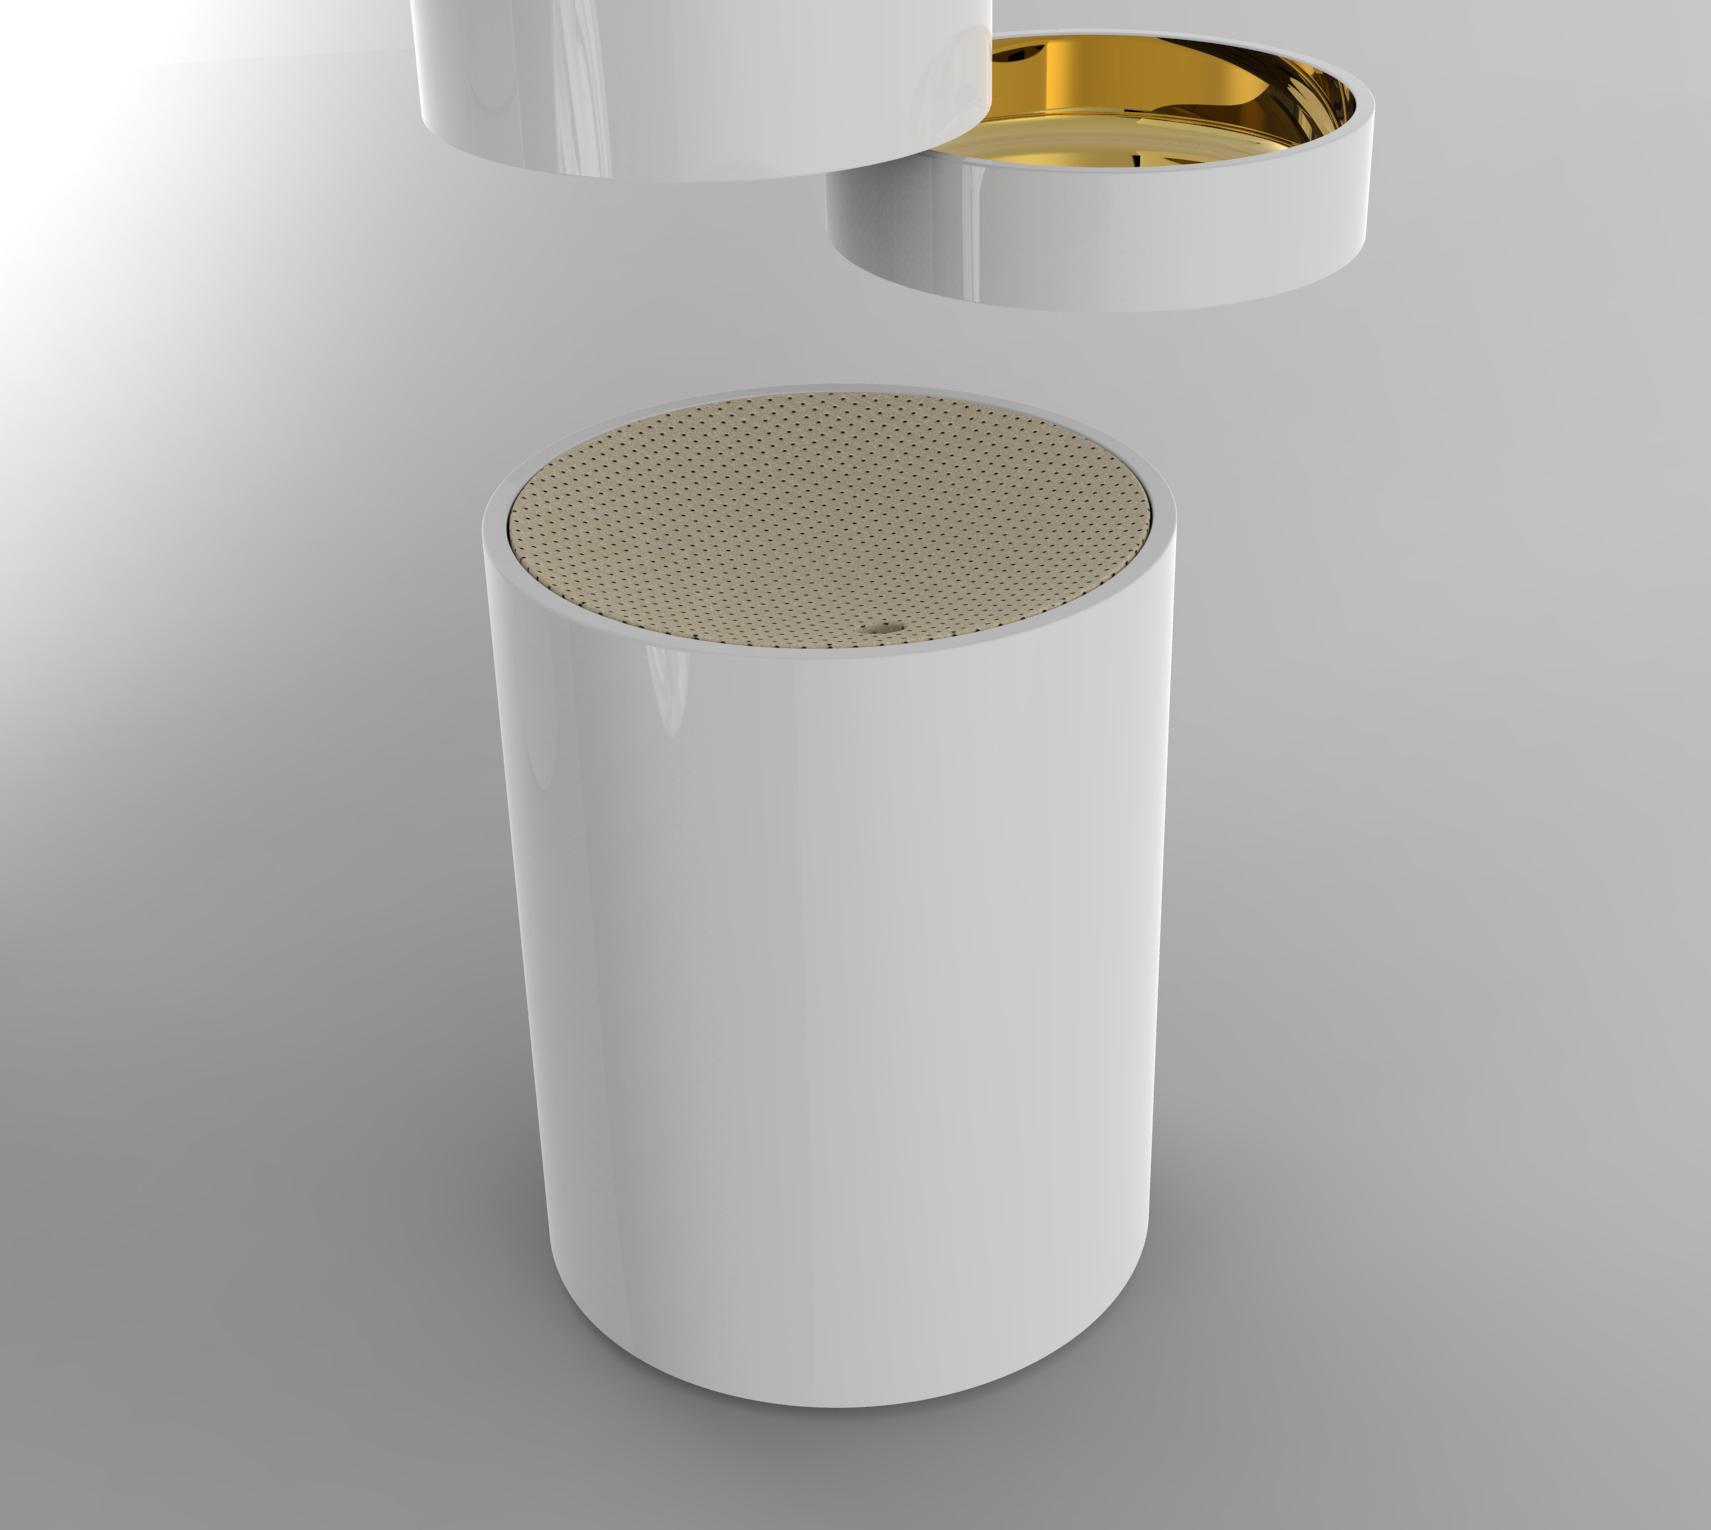 Reece Bathroom Innovation Award Winners